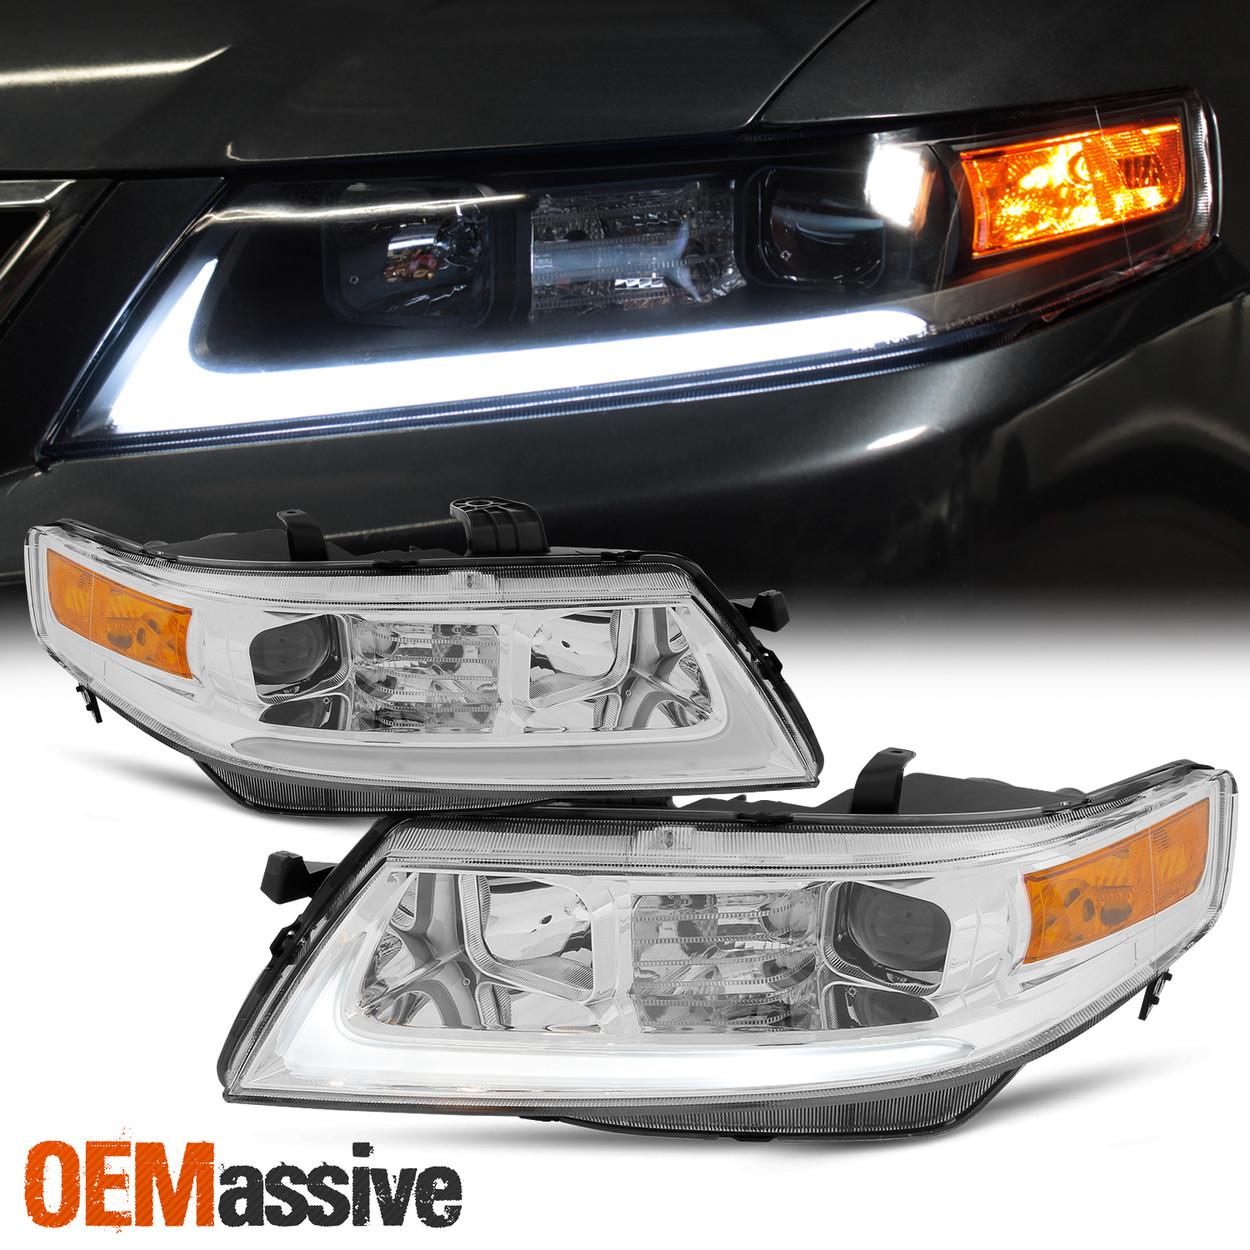 Fits 2004 2005 2006 2007 2008 Acura Tsx Led Bar Projector Headlights Headlamps Oemassive